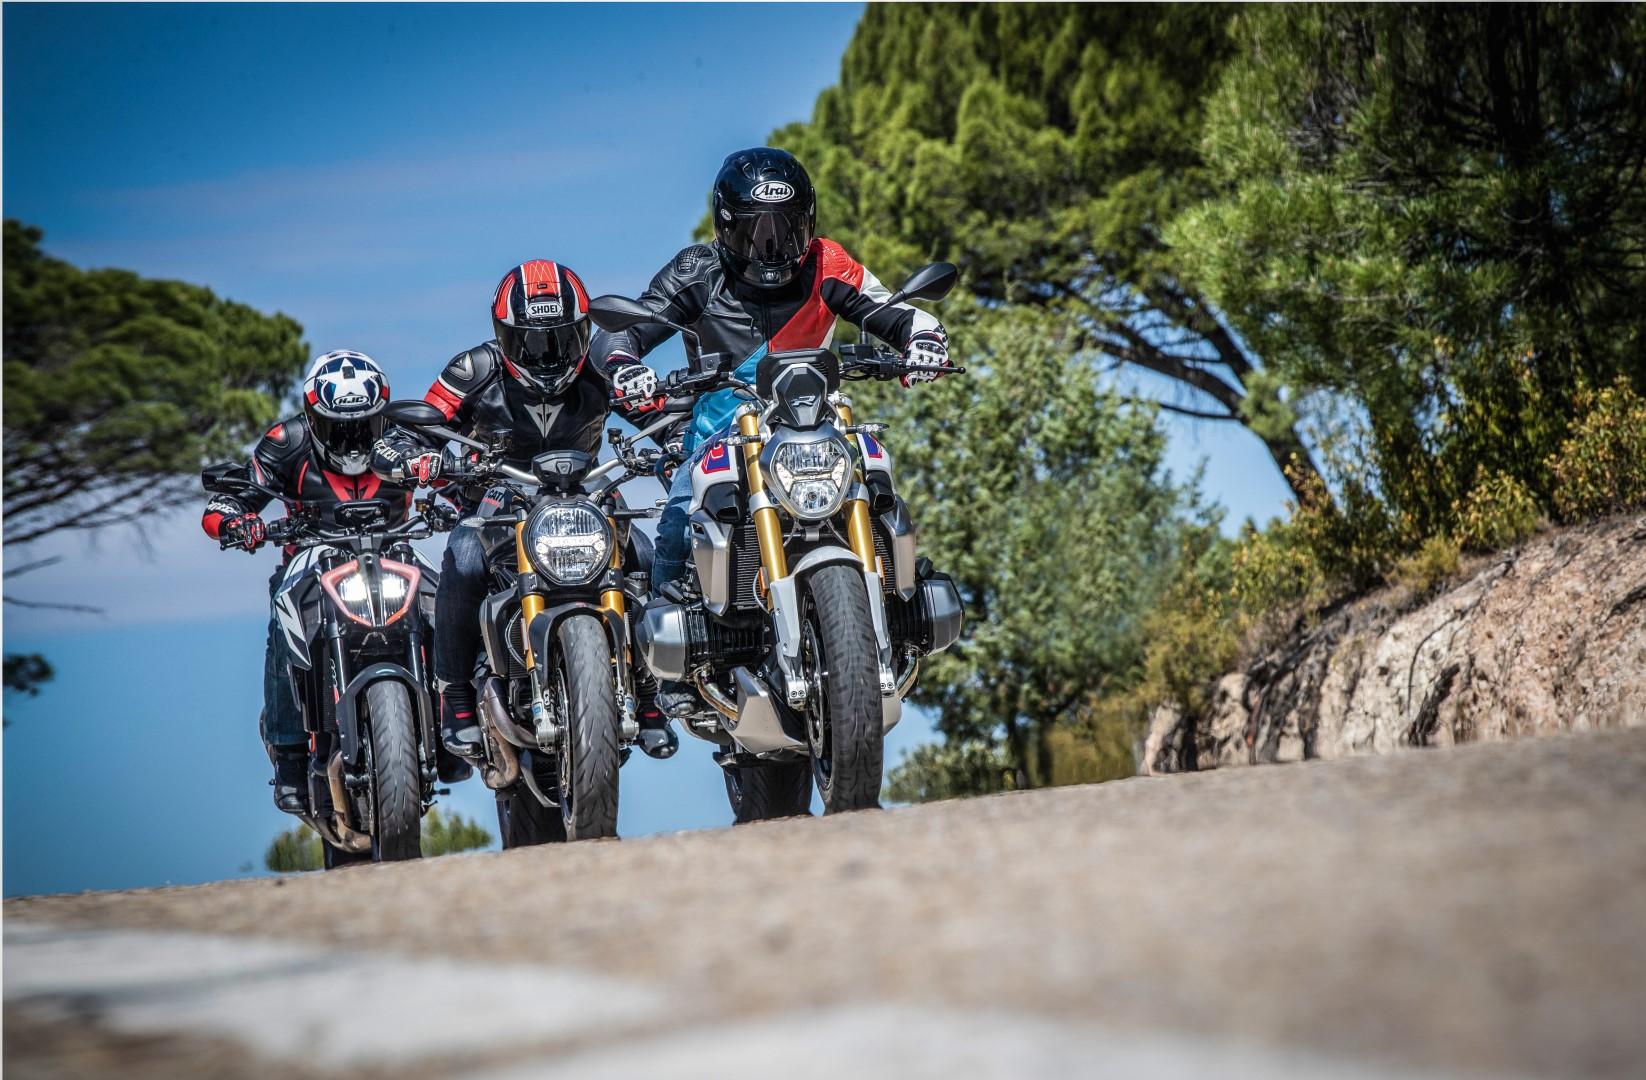 Comparativa Supernaked Grandes Twin: BMW R 1250 R, Ducati Monster 1200 S, KTM 1290 Super Duke R